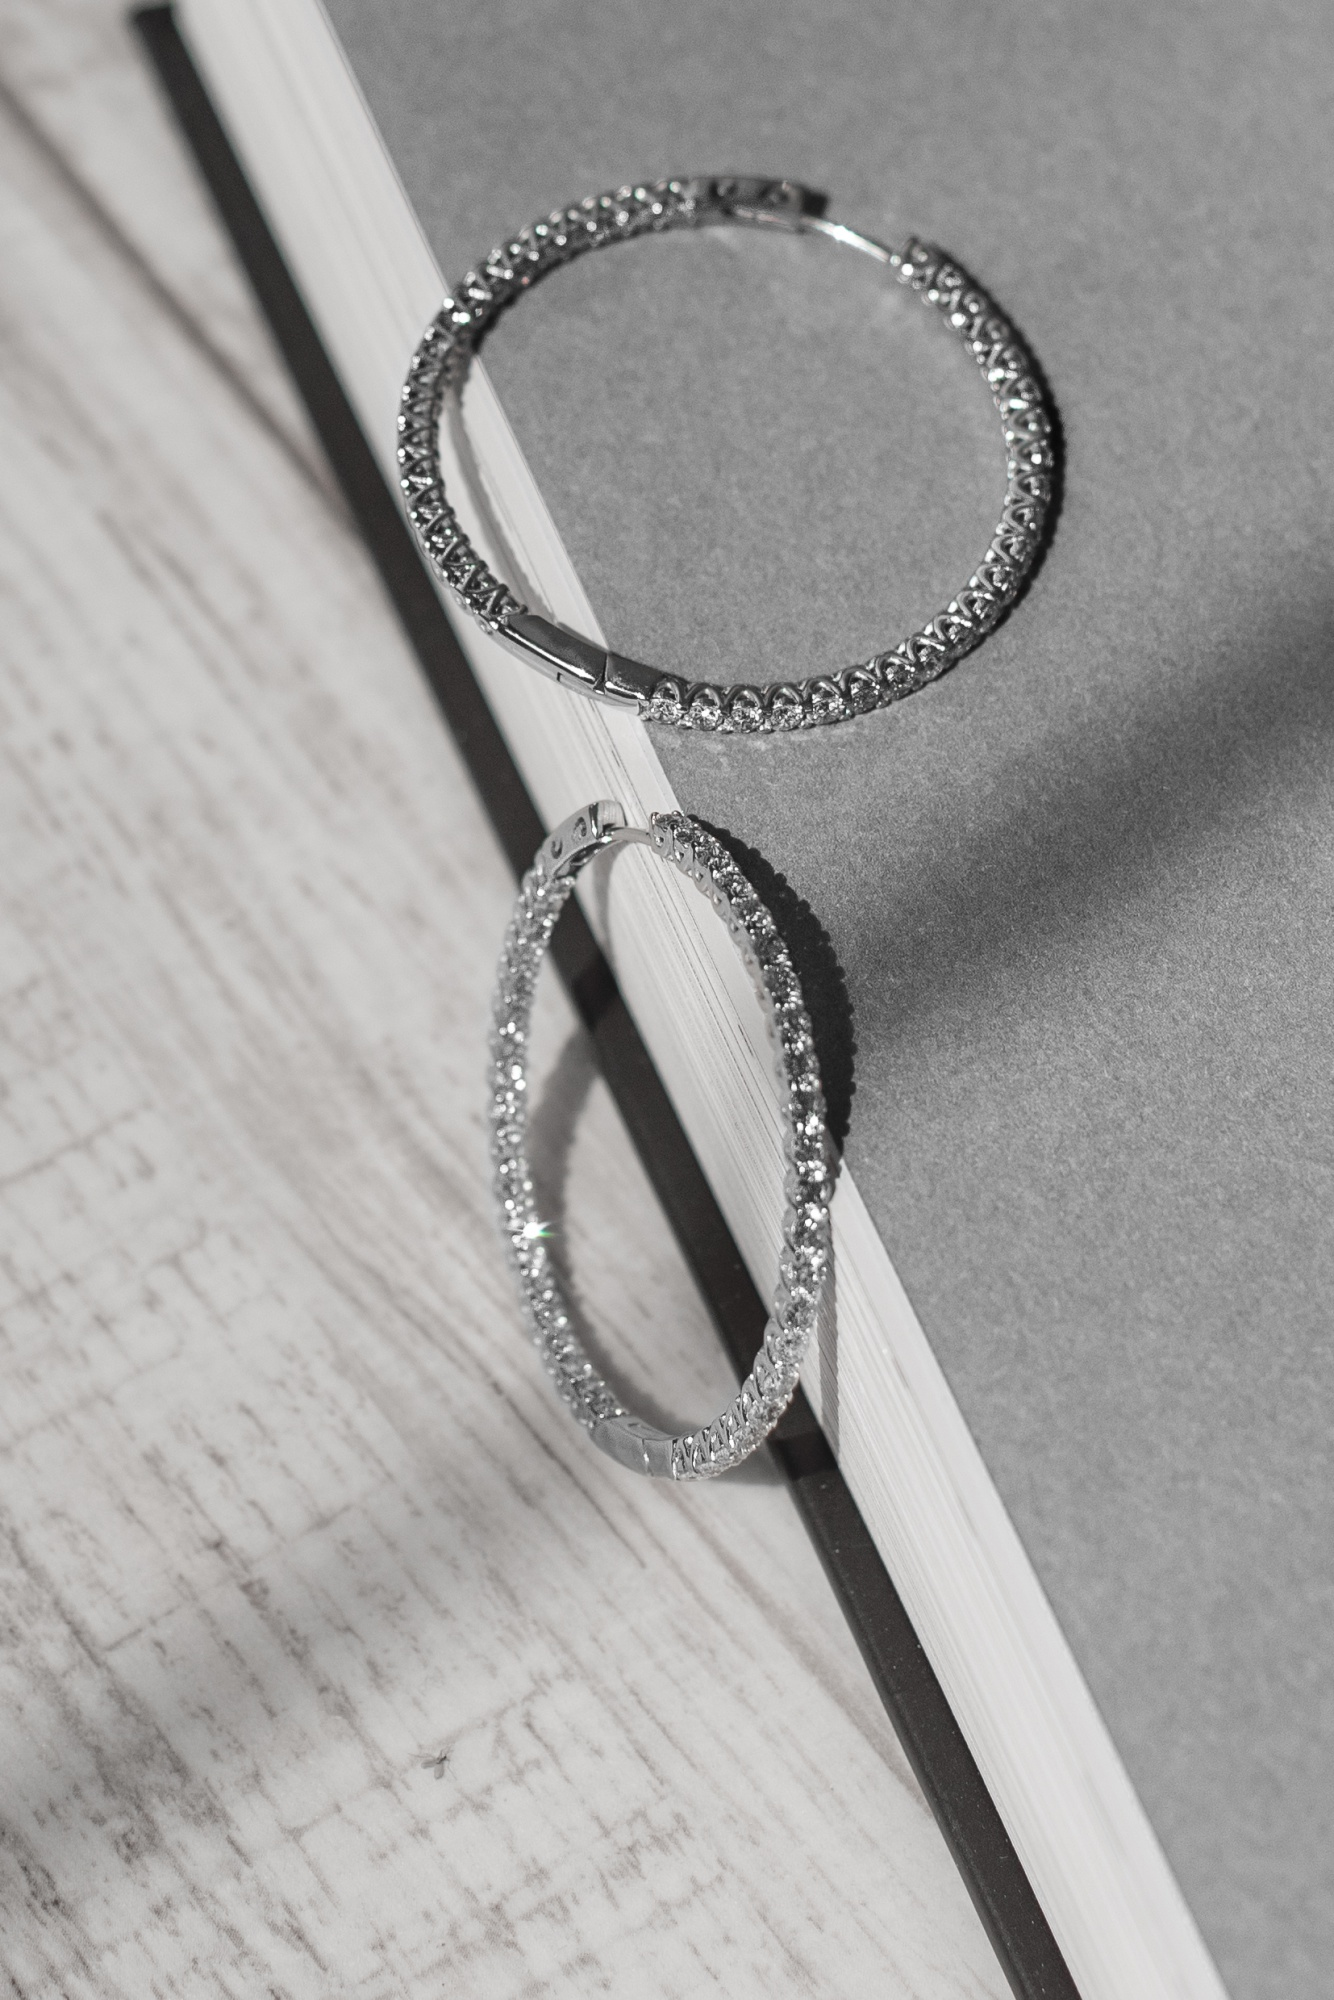 S1 Серьги-конго из белого с 44 бриллиантами 2.14 карат